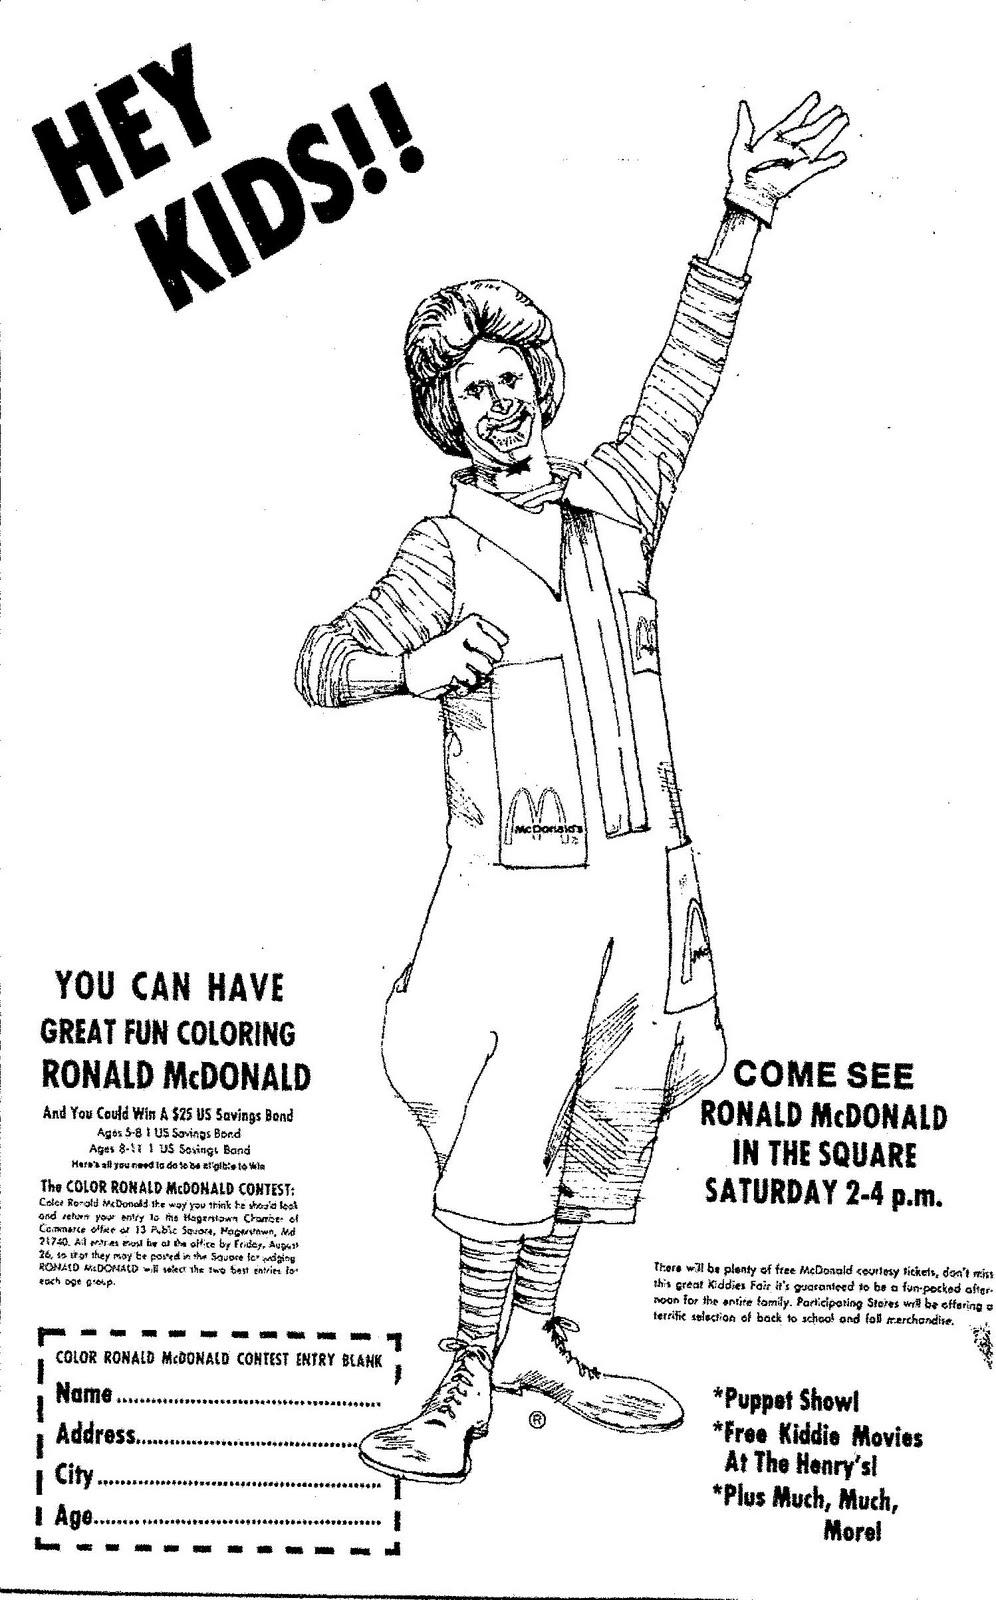 mostly paper dolls color ronald mcdonald contest 1977